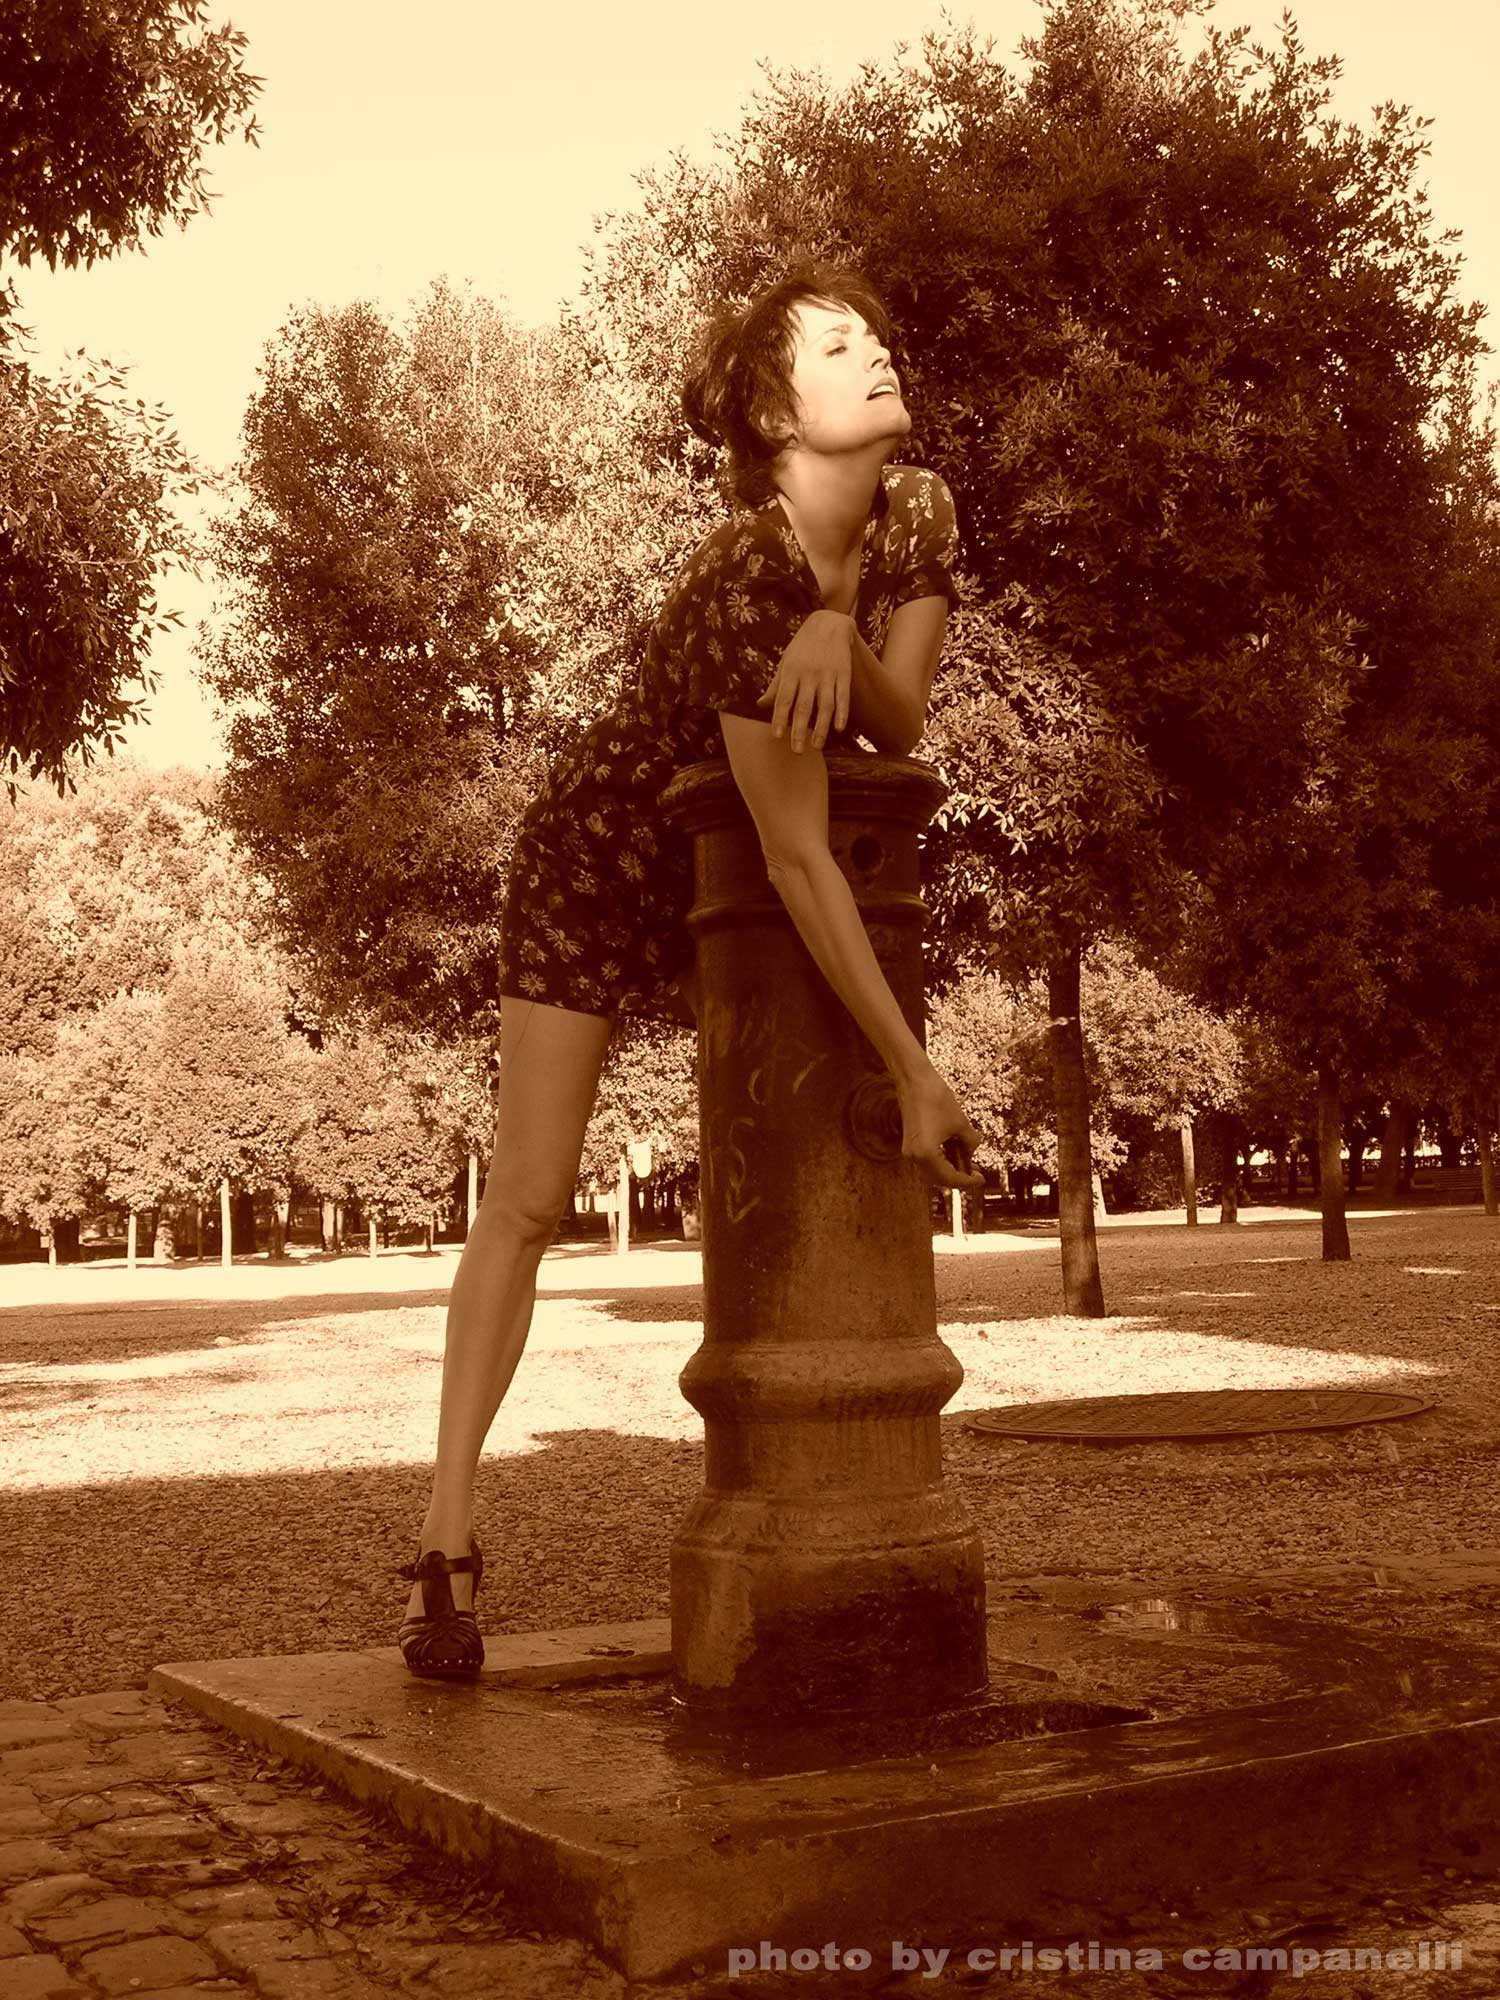 Coralina Cataldi-Tassoni photo by Cristina Campanelli (3).jpg